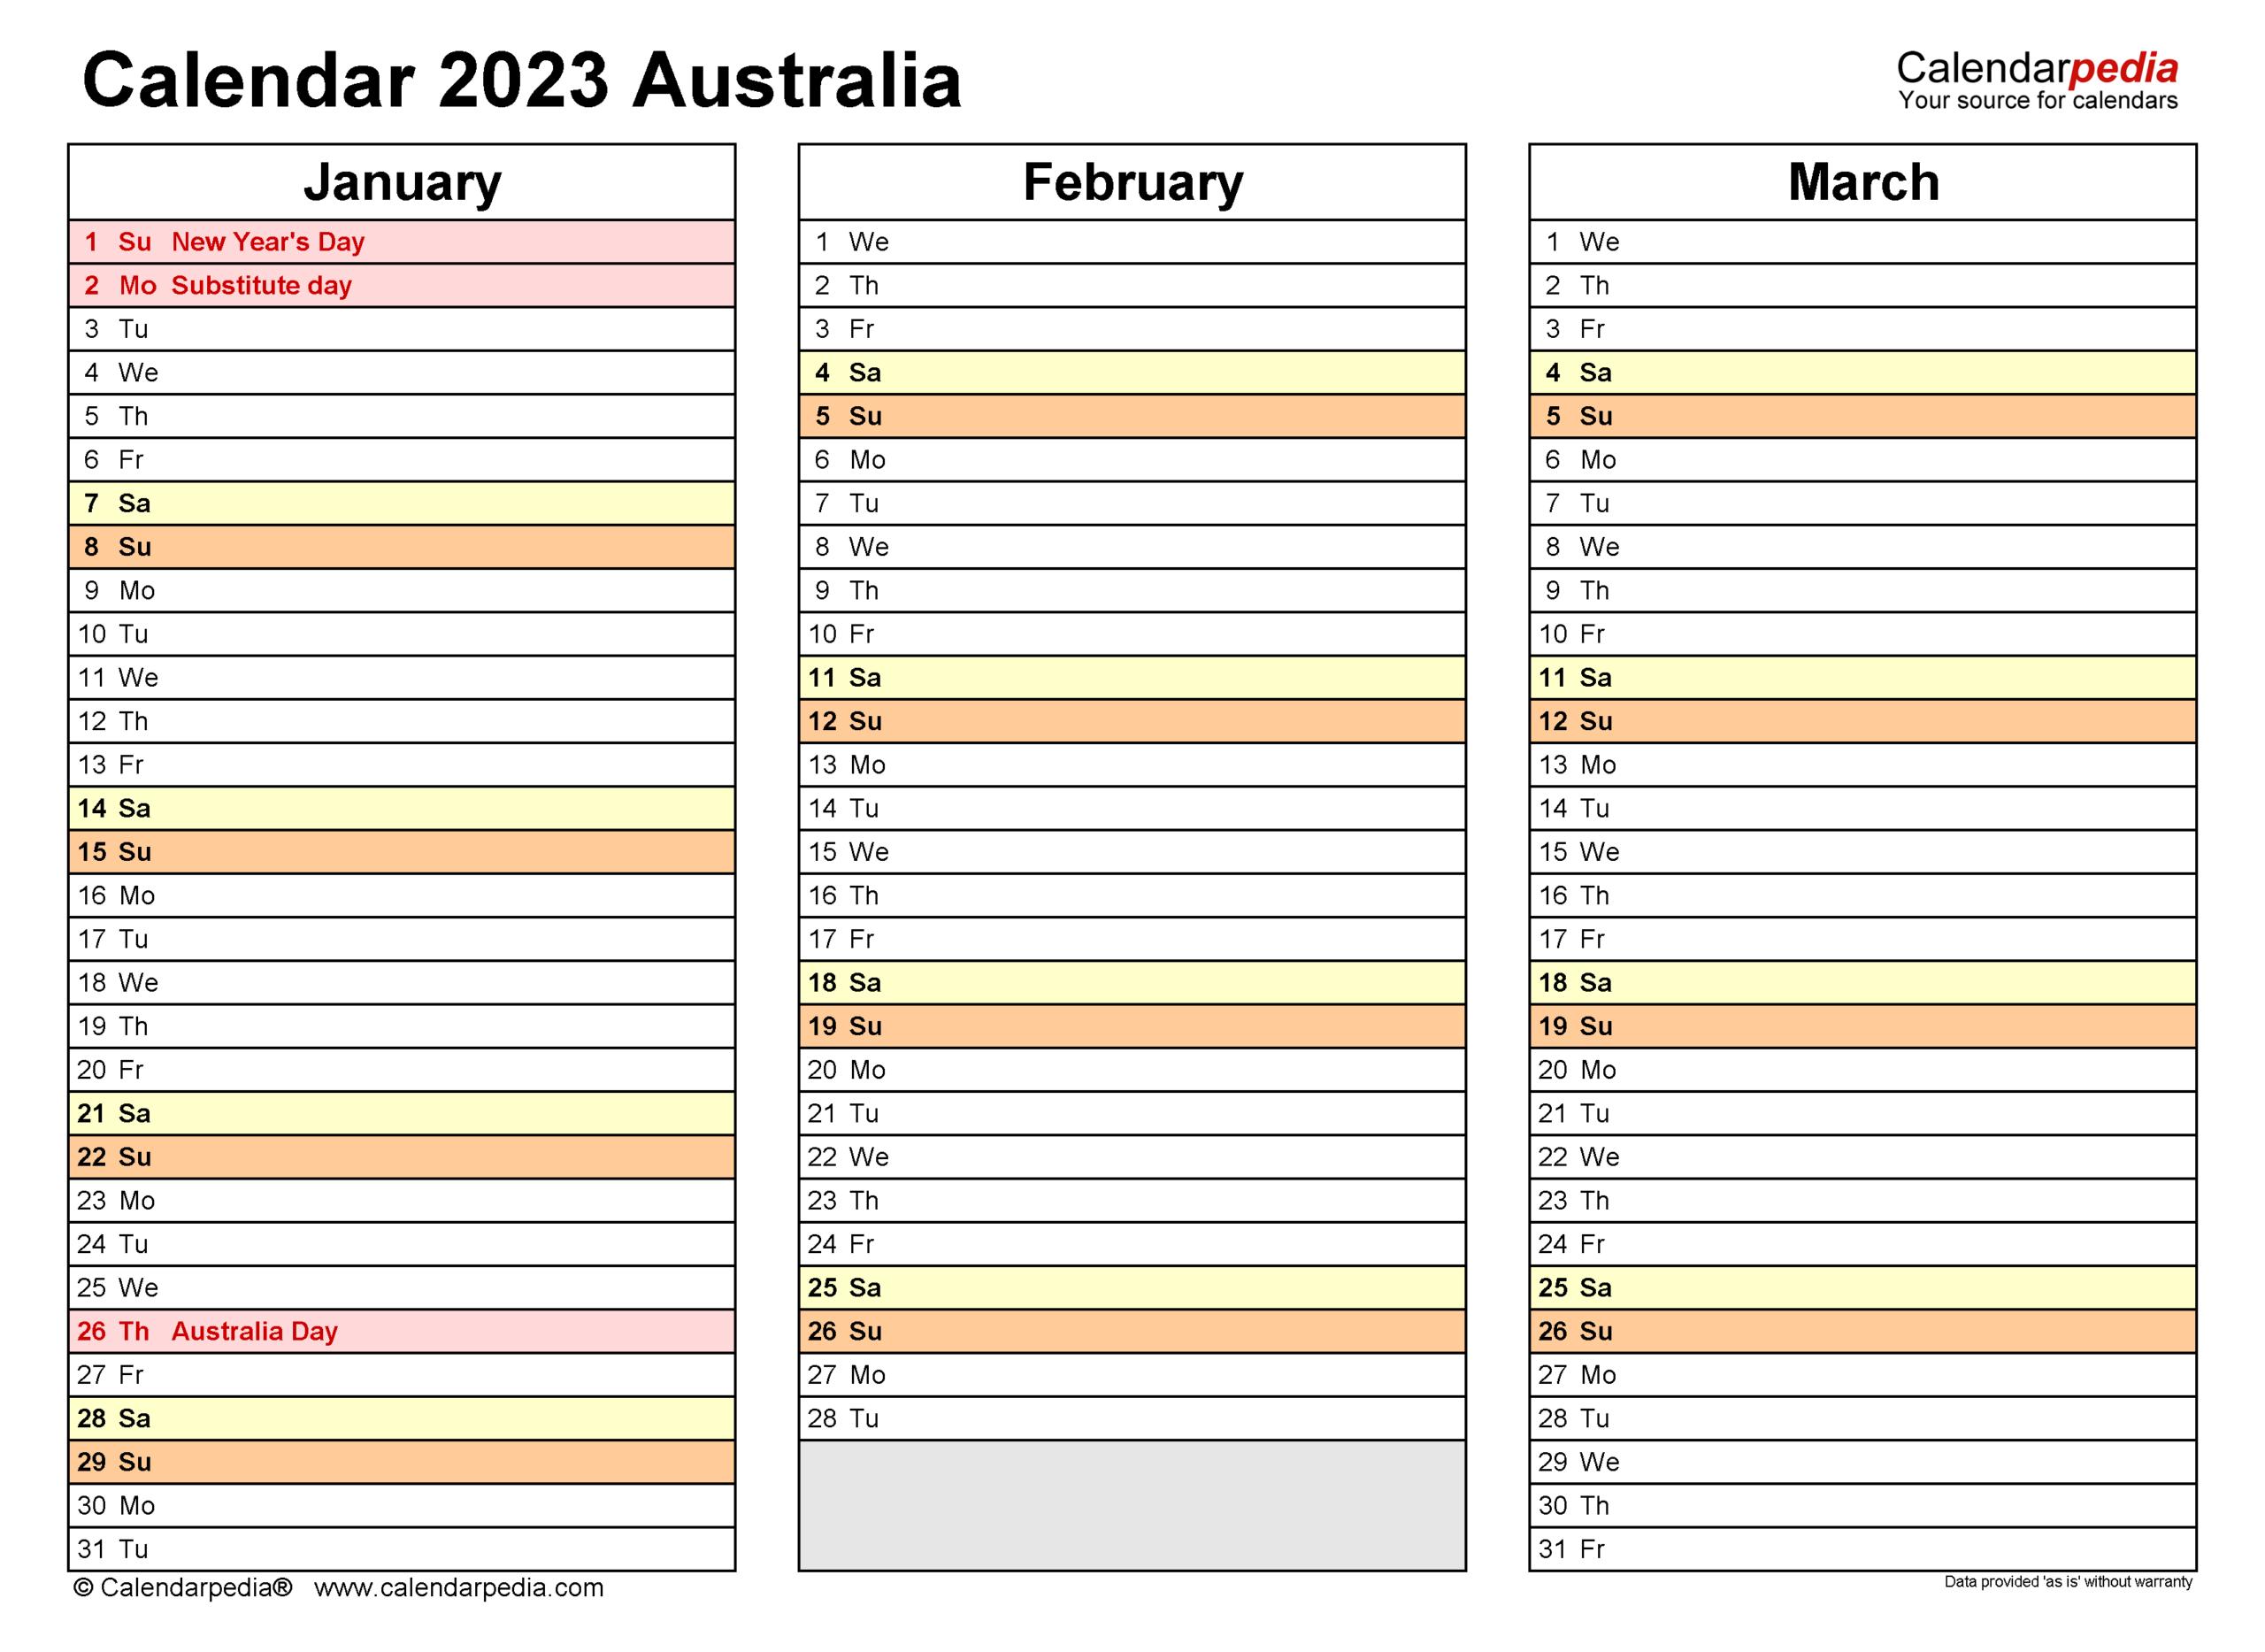 Australia Calendar 2023 - Free Printable Pdf Templates inside 4 5 4 Retail Calendar 2022 2023